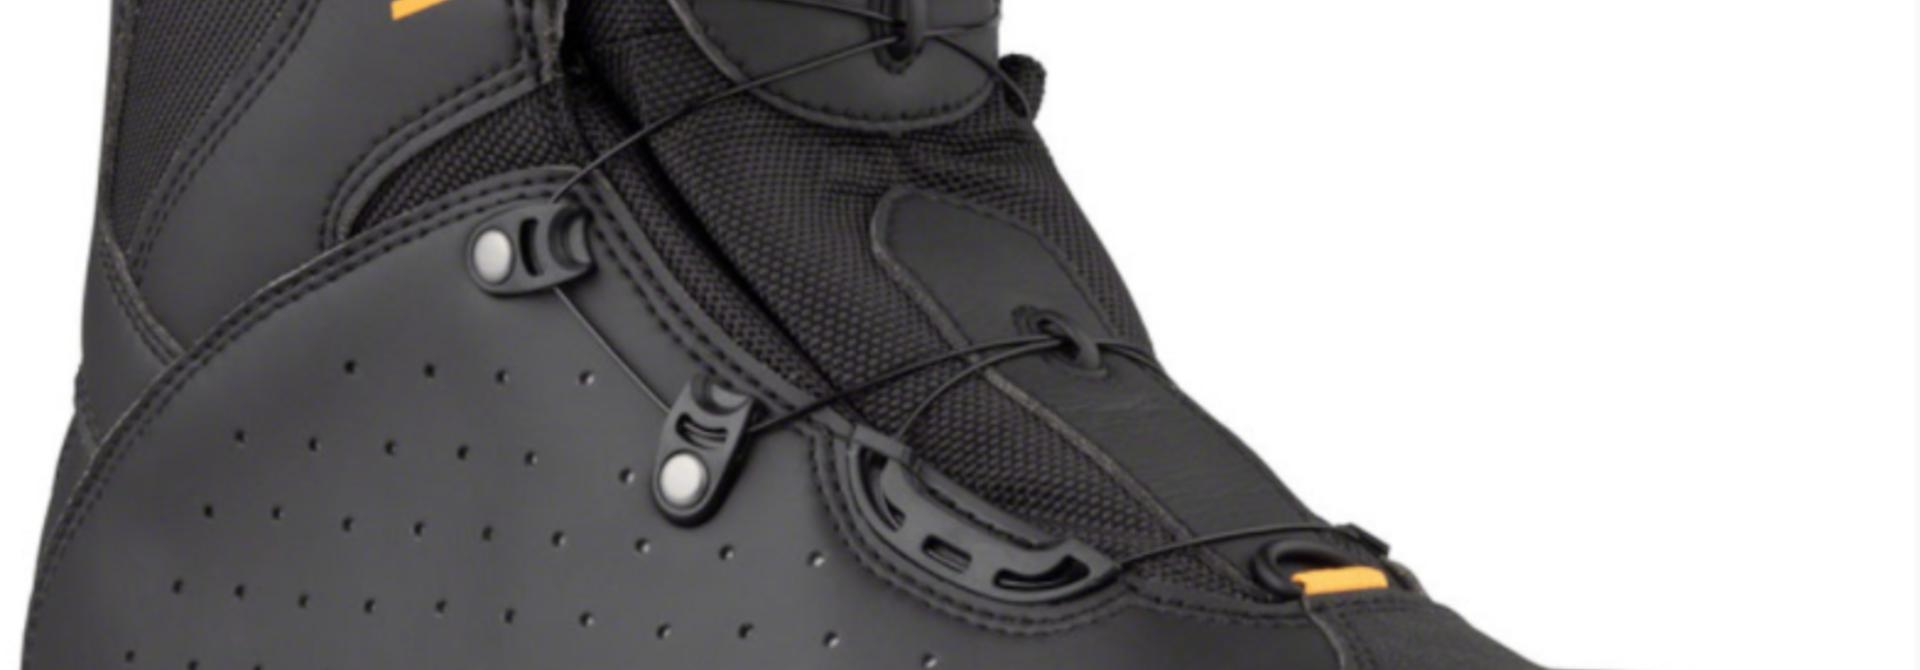 45NRTH Wolvhammer BOA Boot Black